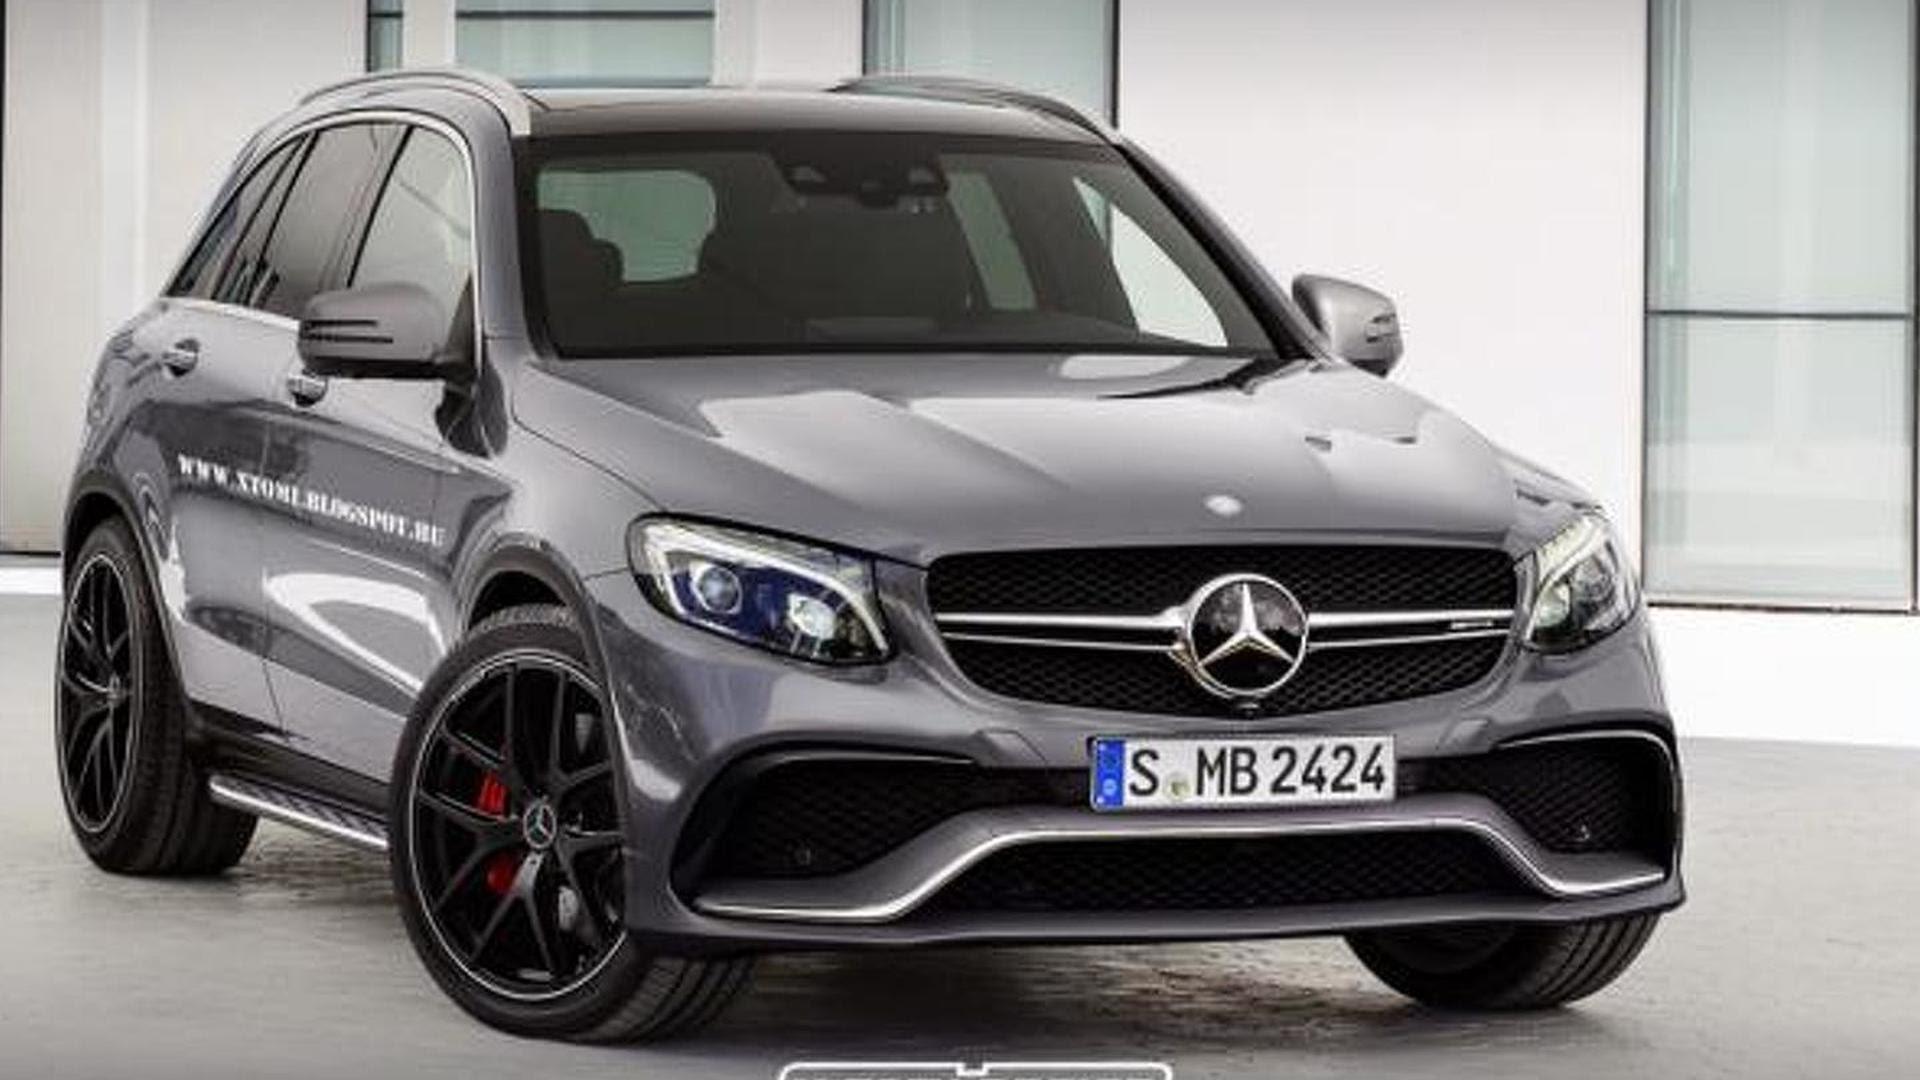 Rumored Mercedes-Benz GLC 63 AMG rendered